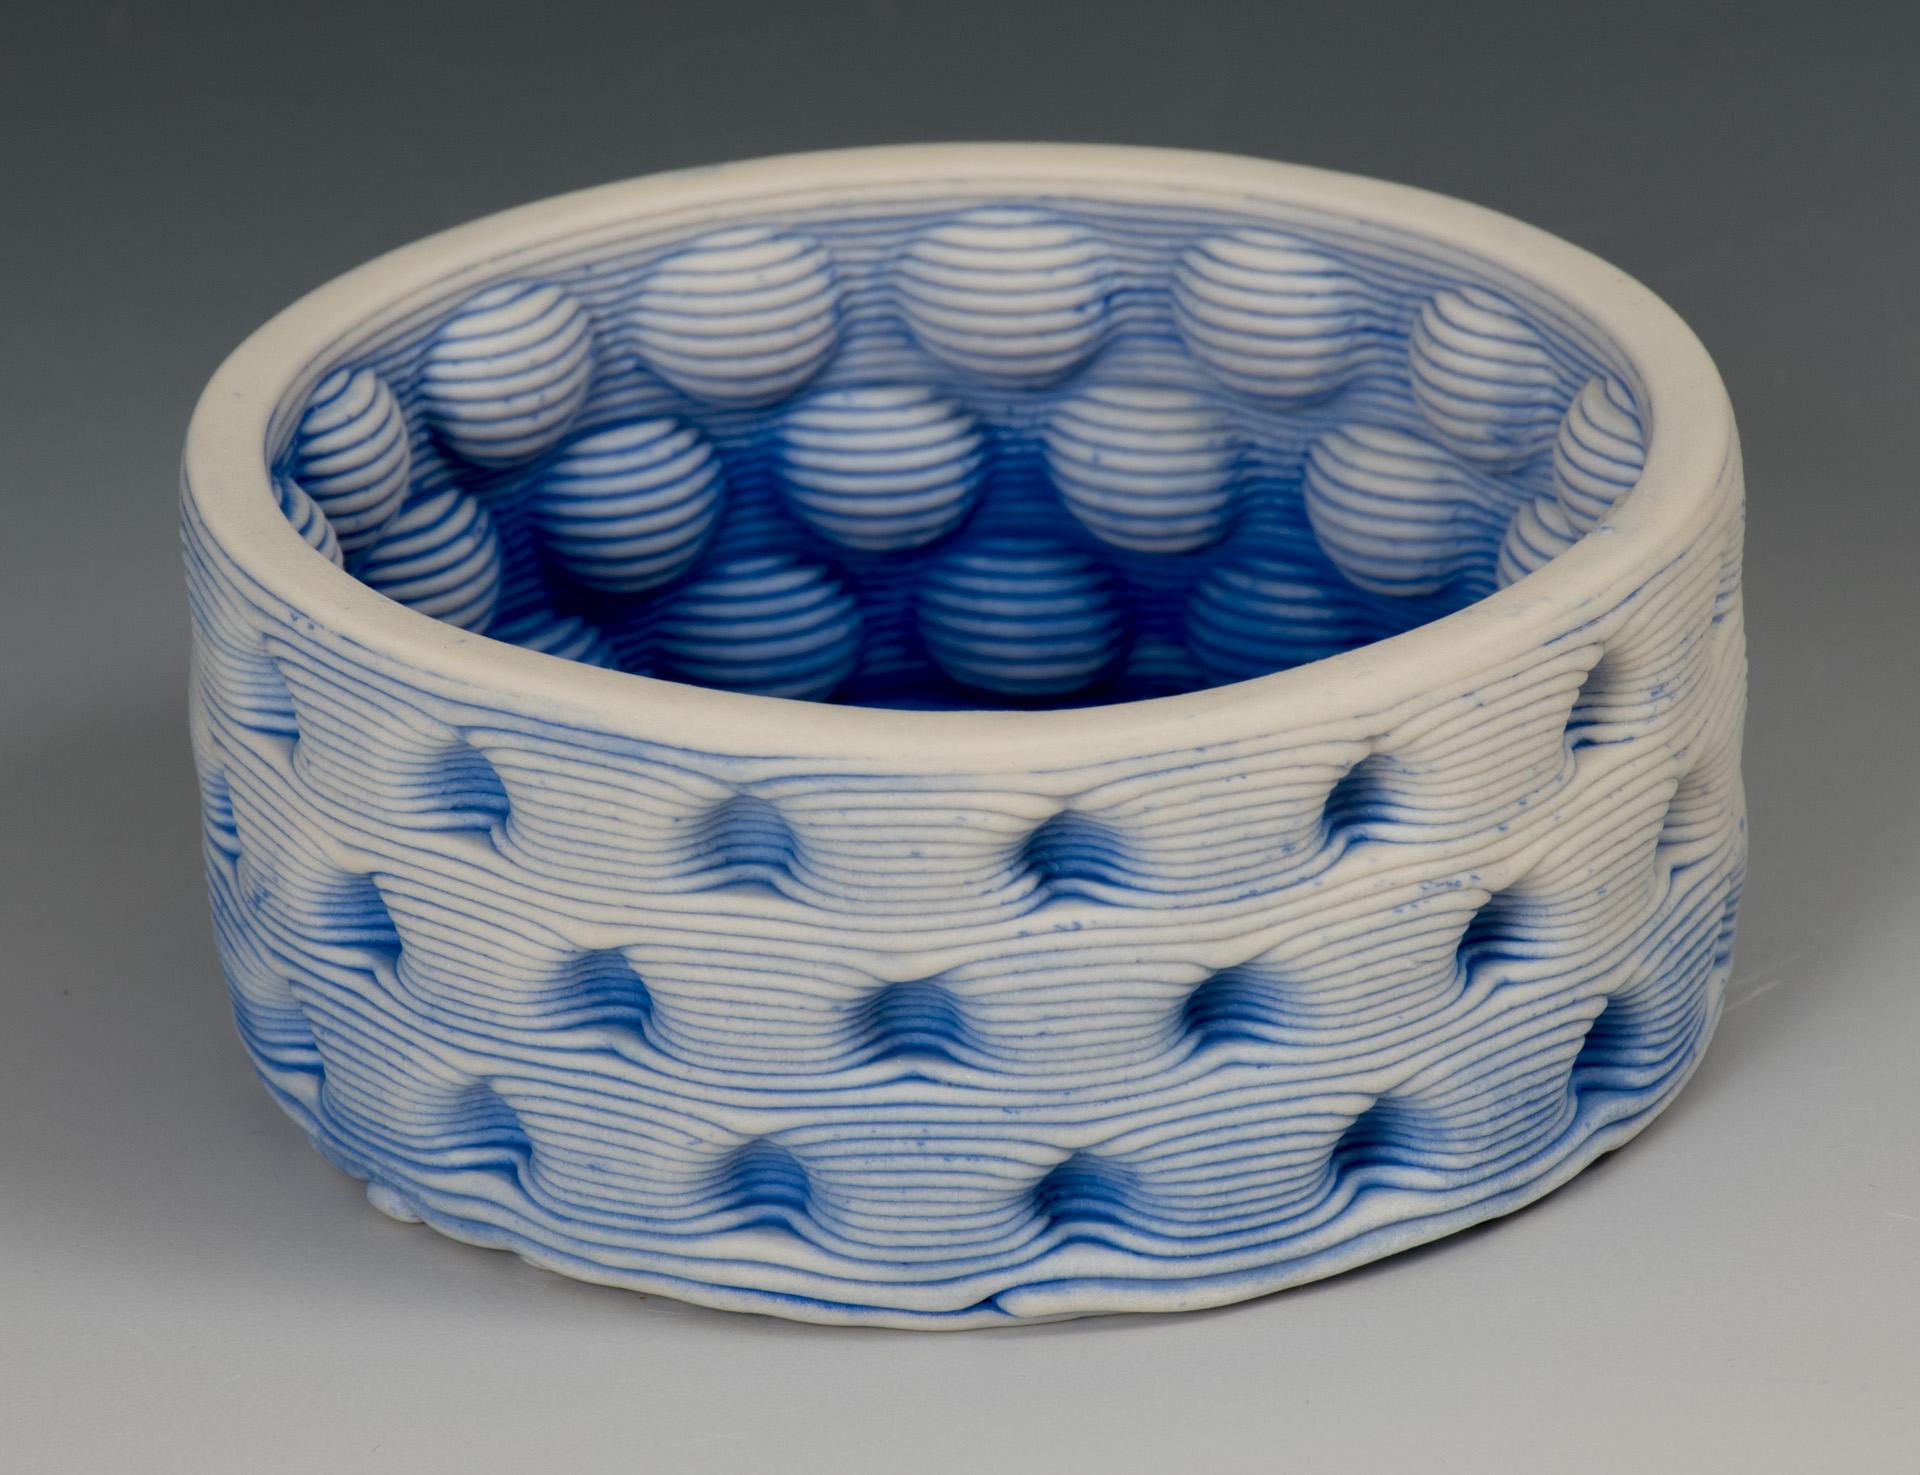 orbit_bowl.JPG